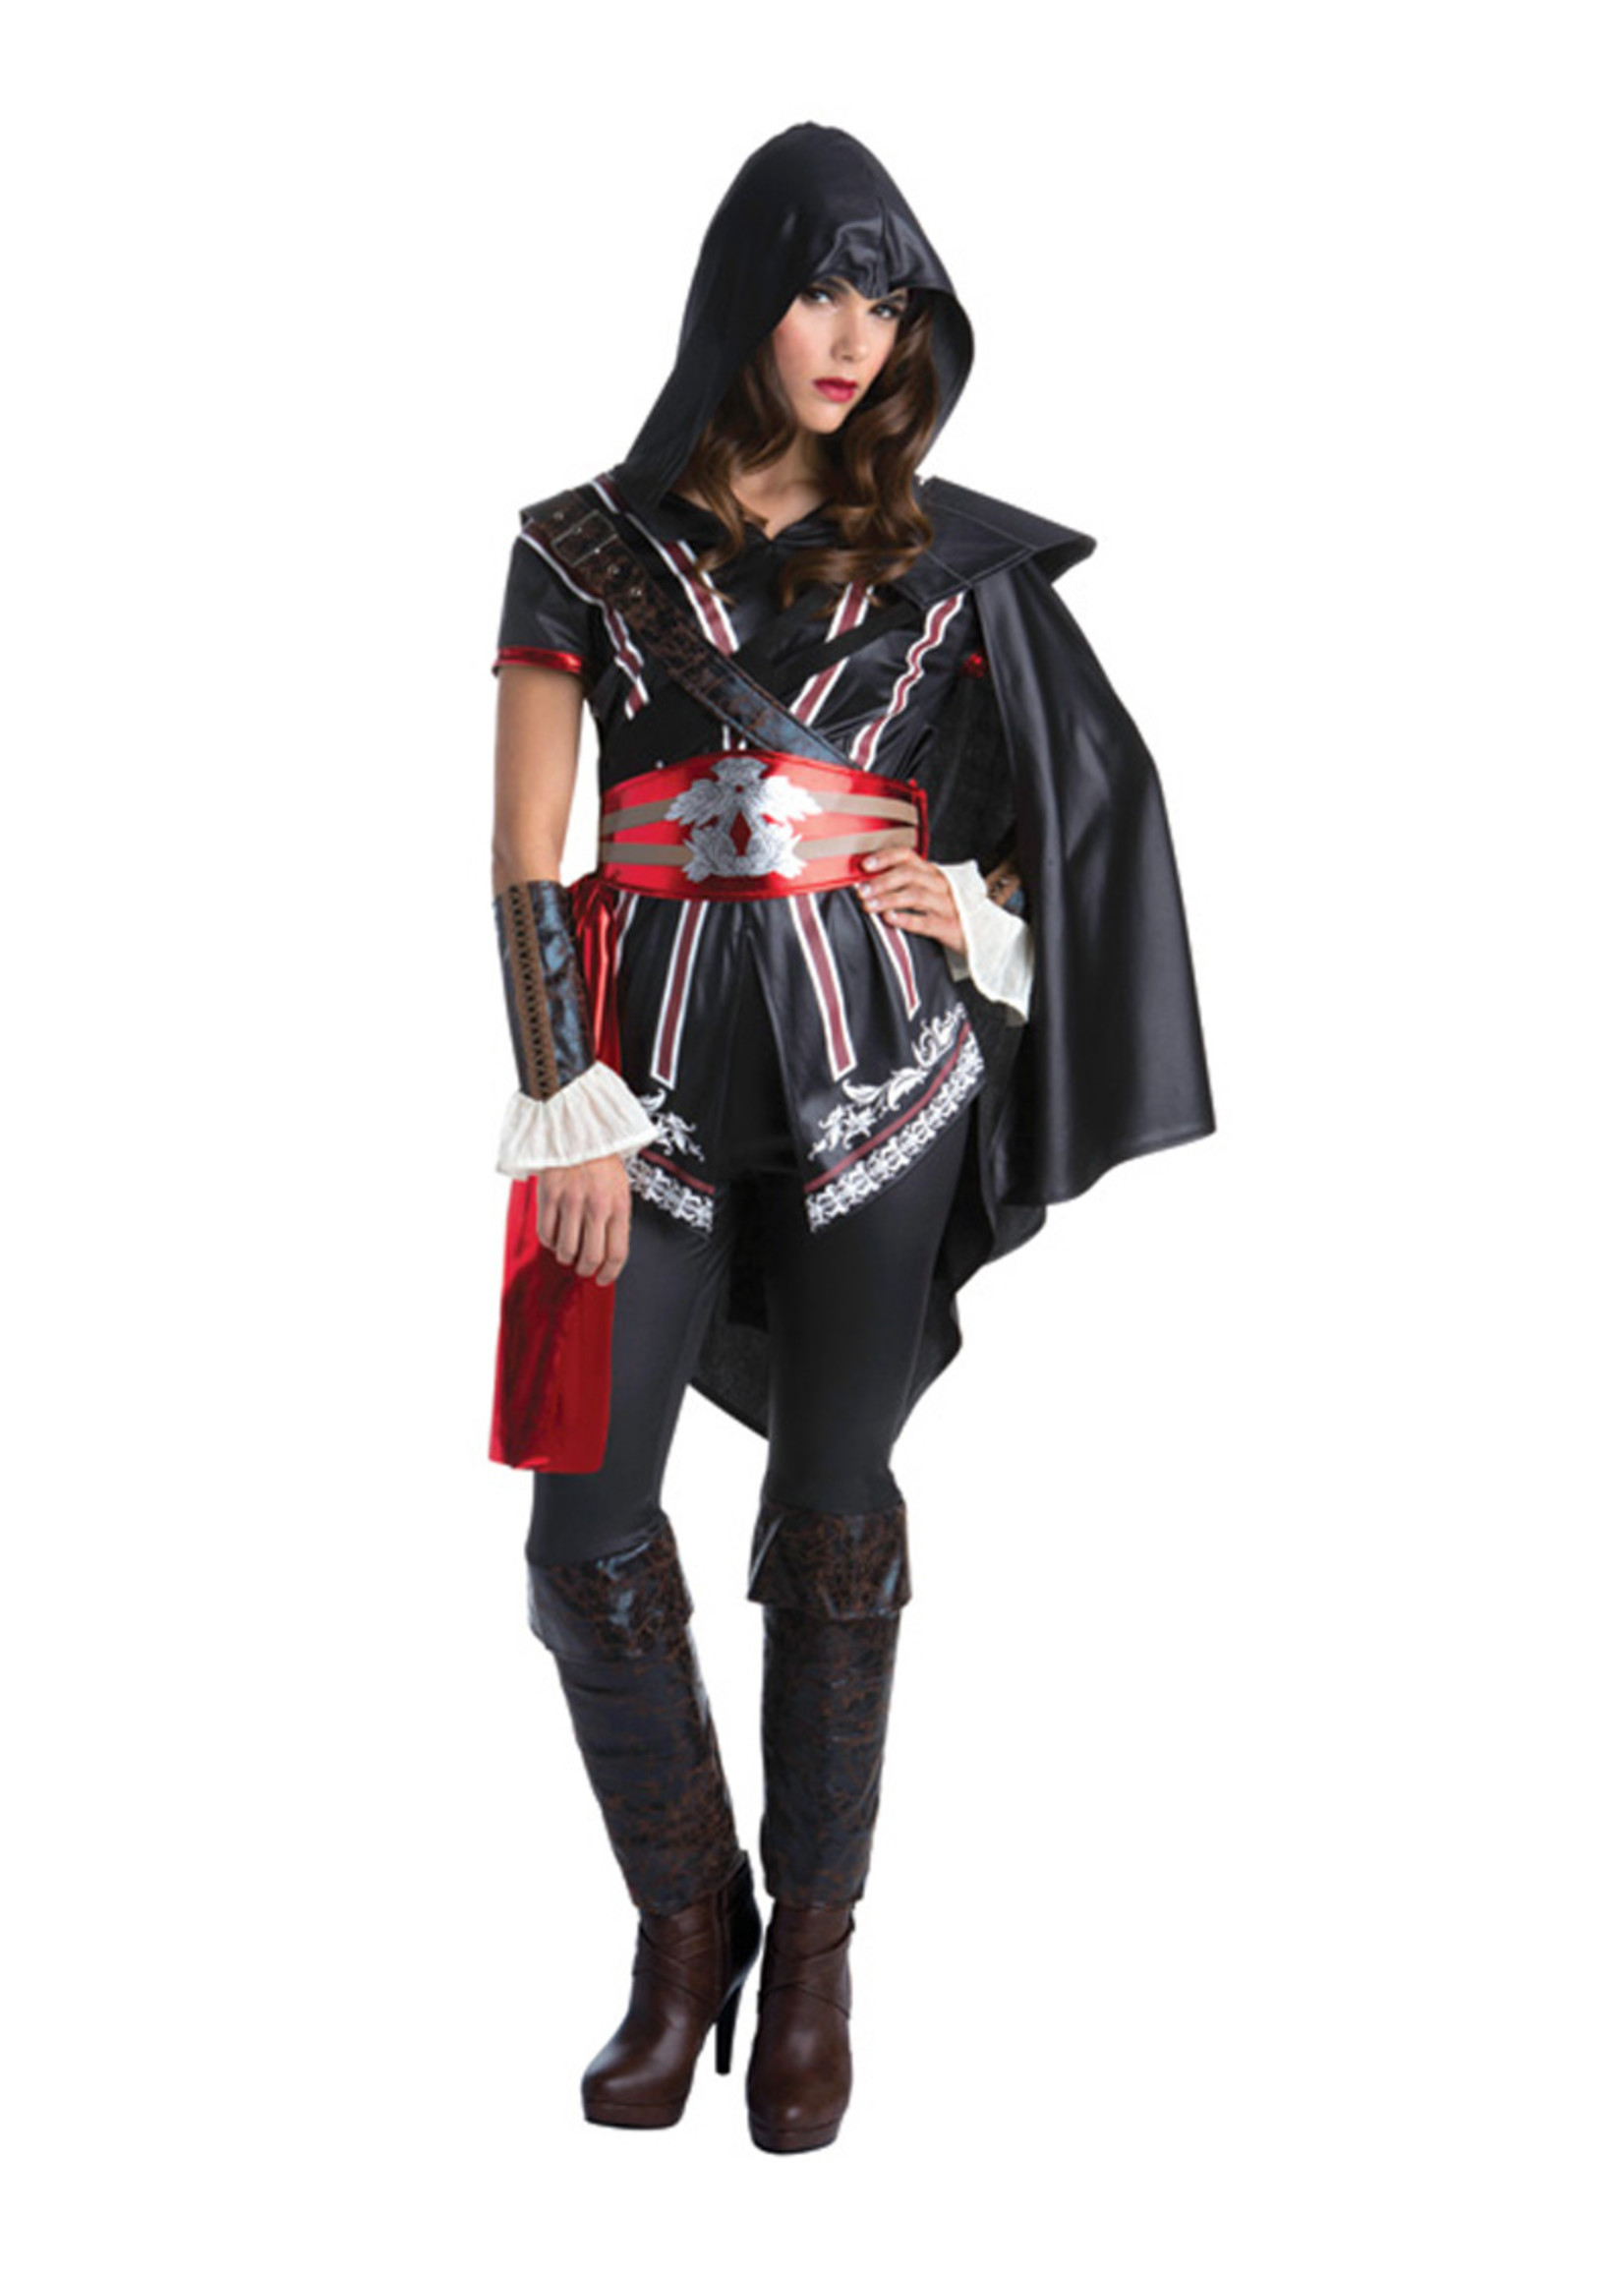 Ezio - Assassin's Creed Costume - Women's